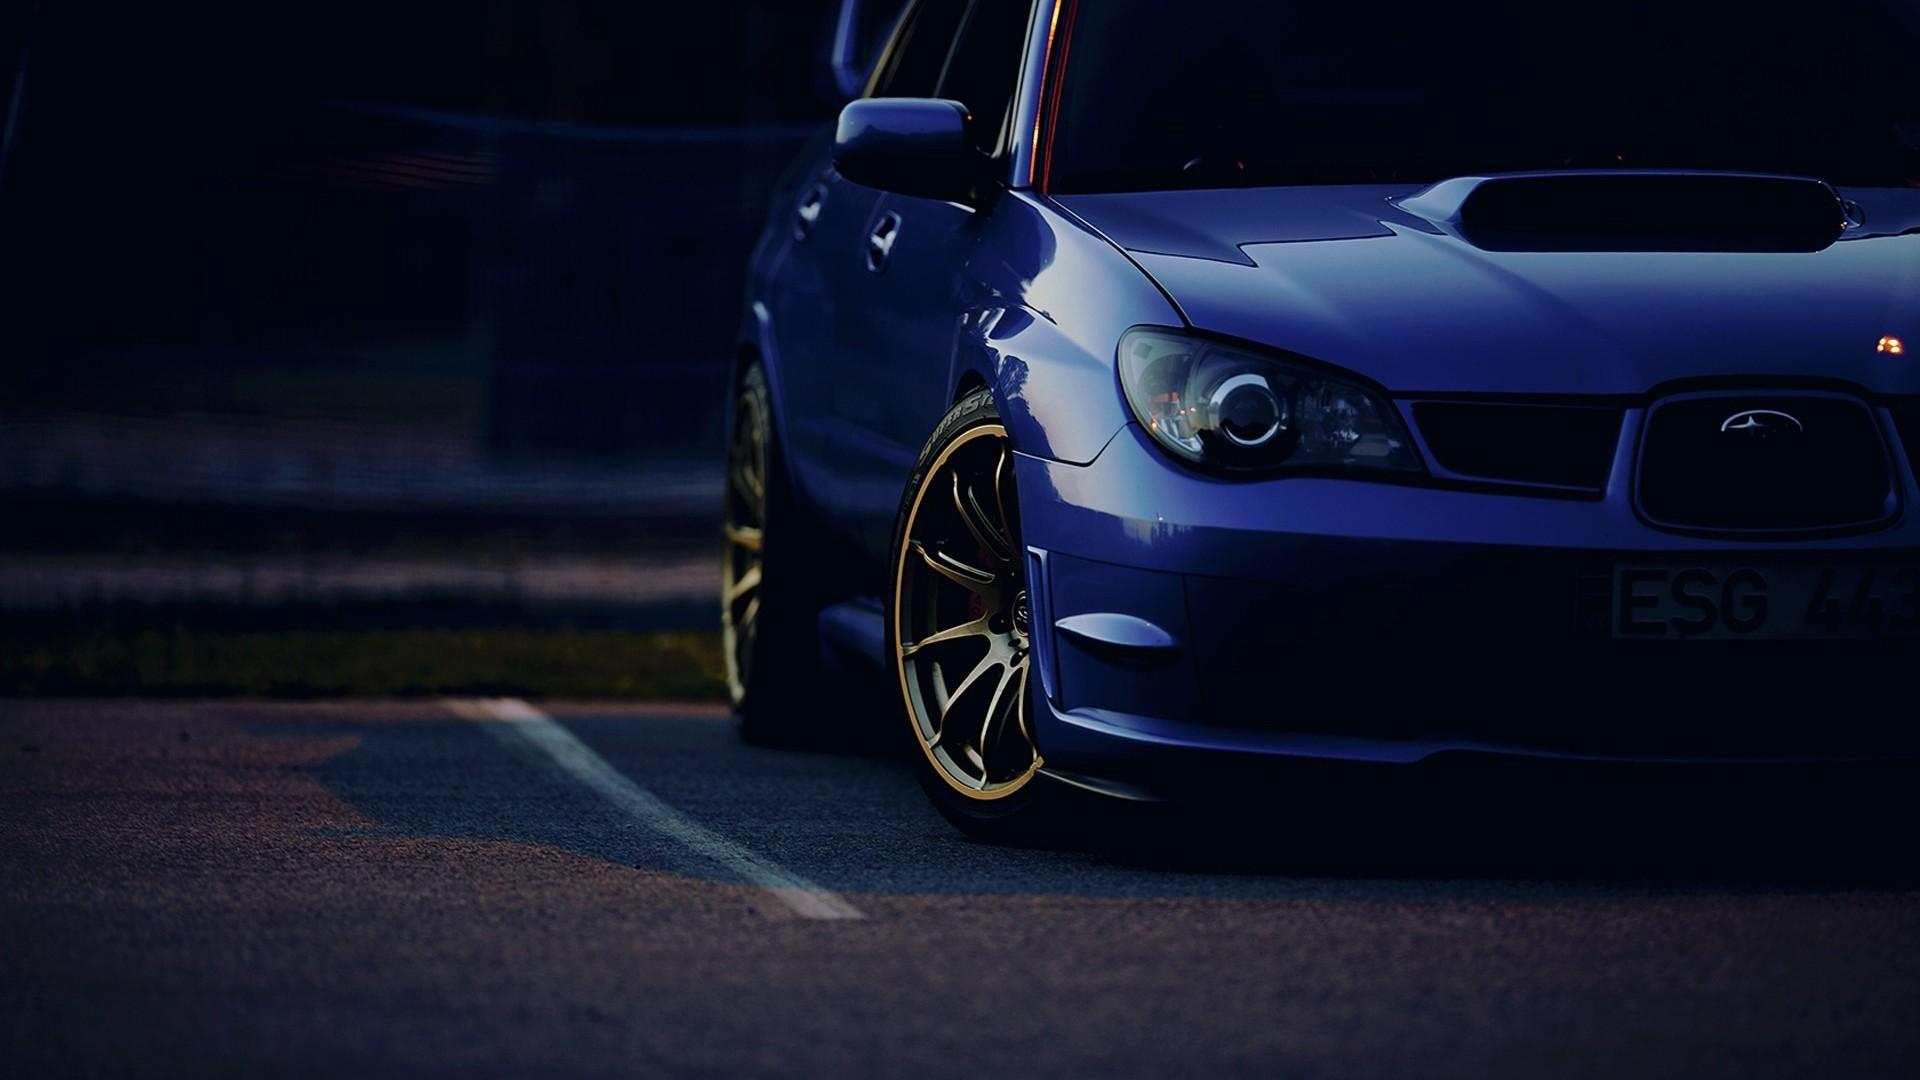 Subaru impreza wallpaper wallpapersafari subaru impreza wrx sti car wallpaper hd wallpaper wallpaperlepi vanachro Images